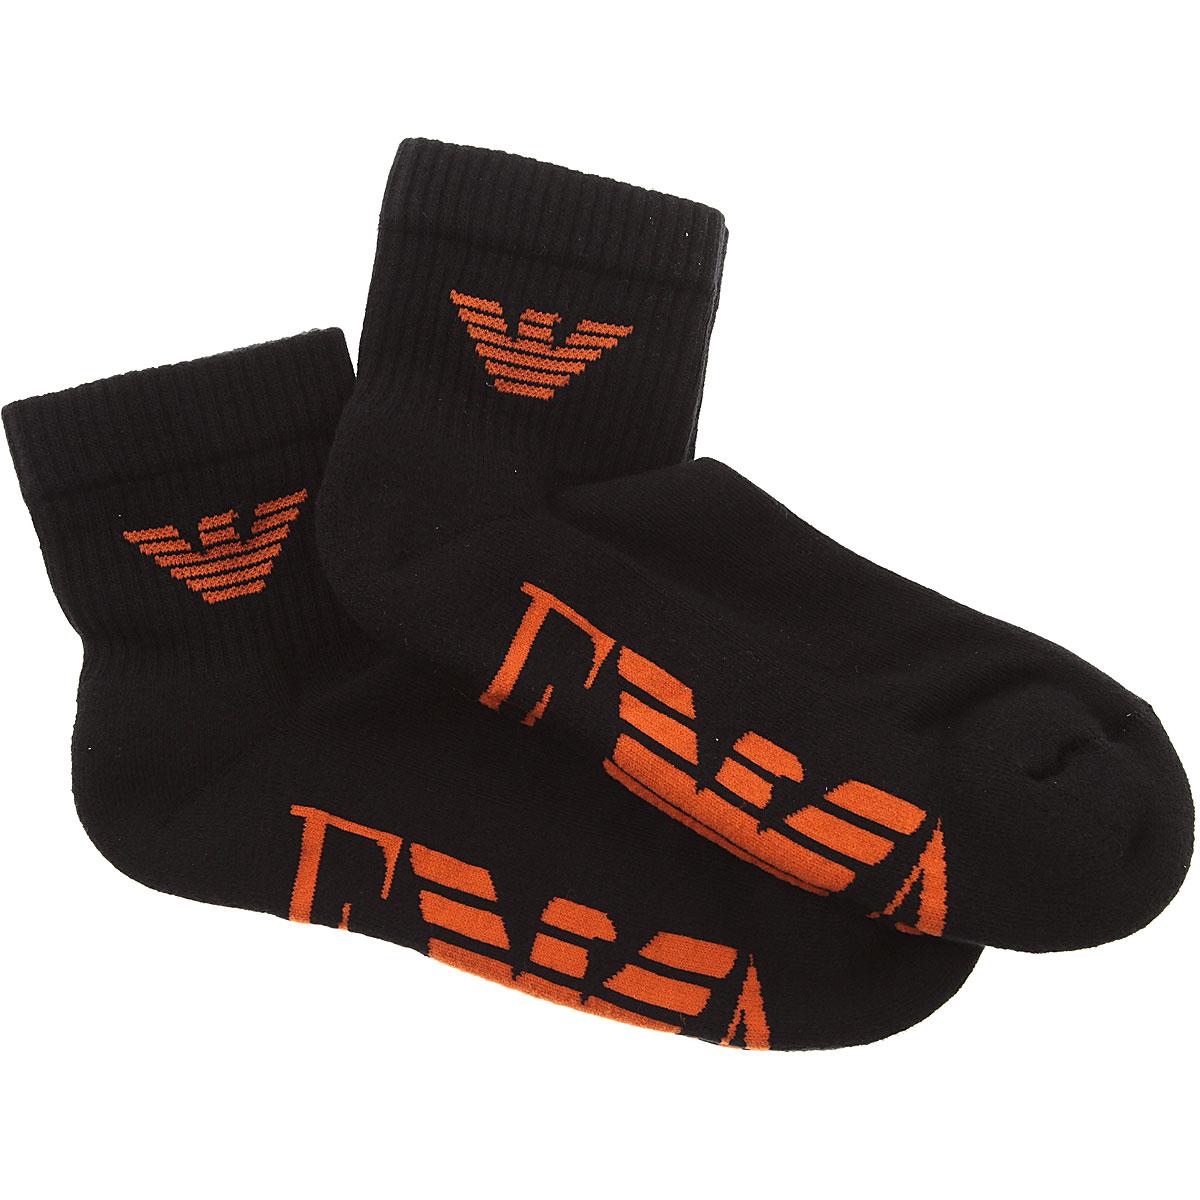 Image of Emporio Armani Socks Socks for Men, 2 Pack, Black, Cotton, 2017, S - M L - XL